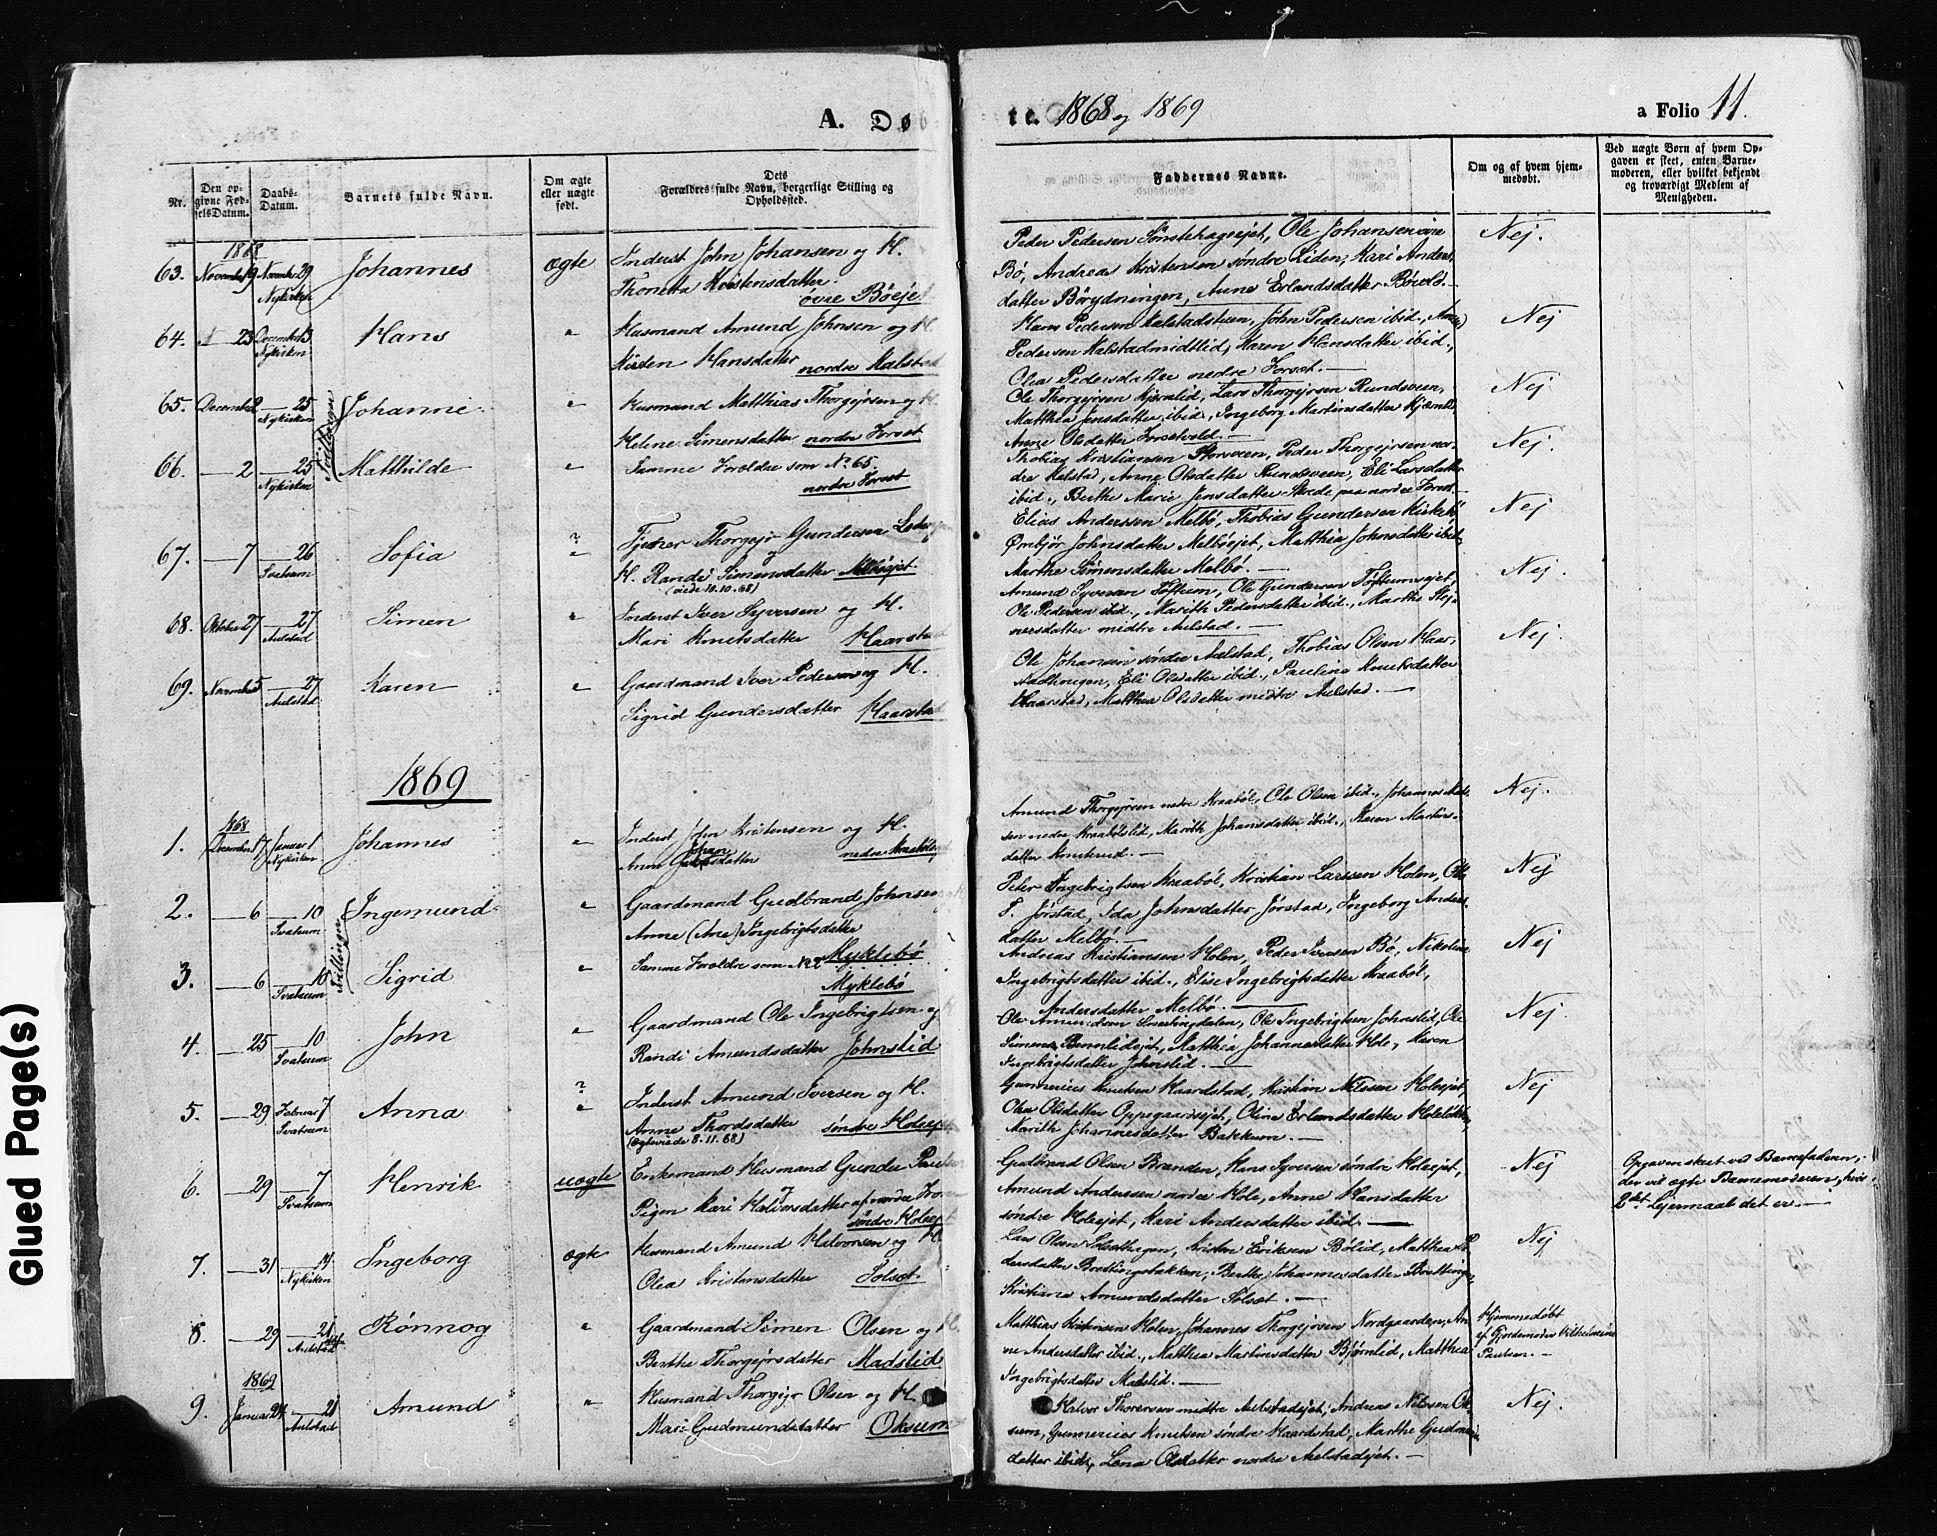 SAH, Gausdal prestekontor, Ministerialbok nr. 10, 1867-1886, s. 11